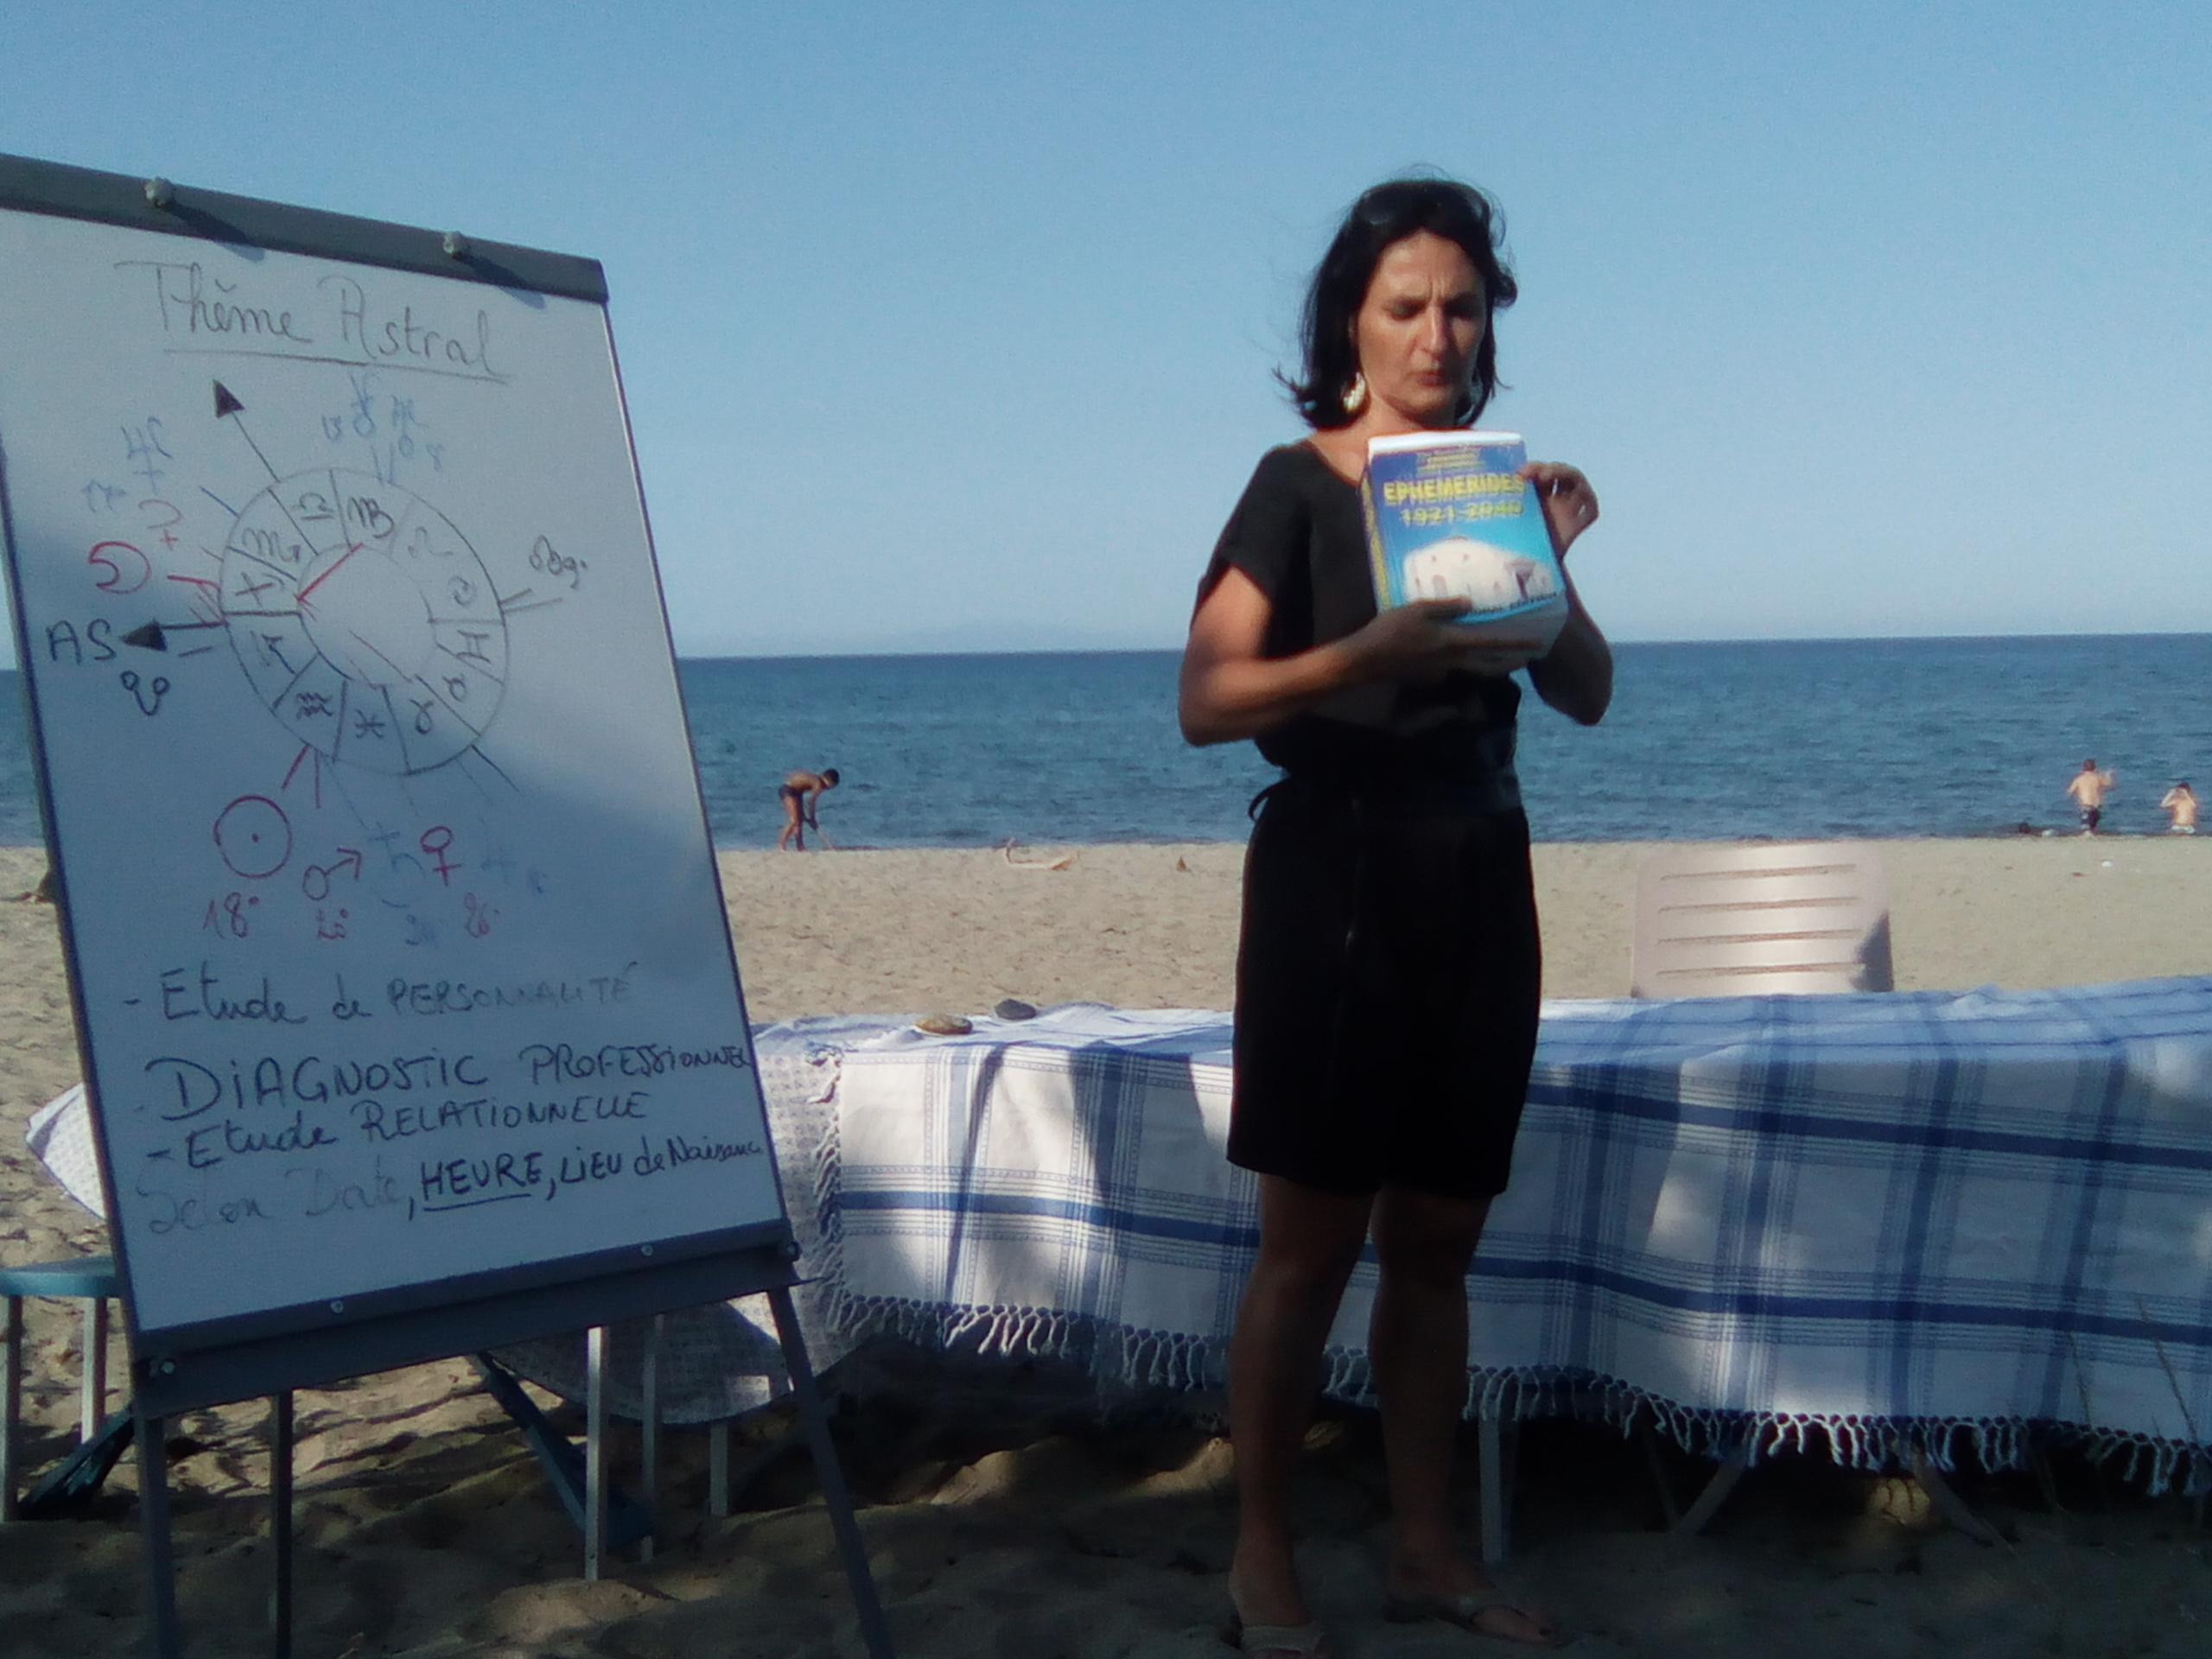 conférences elizabeth navarro conseil 06 09 69 86 89 elizabeth navarro